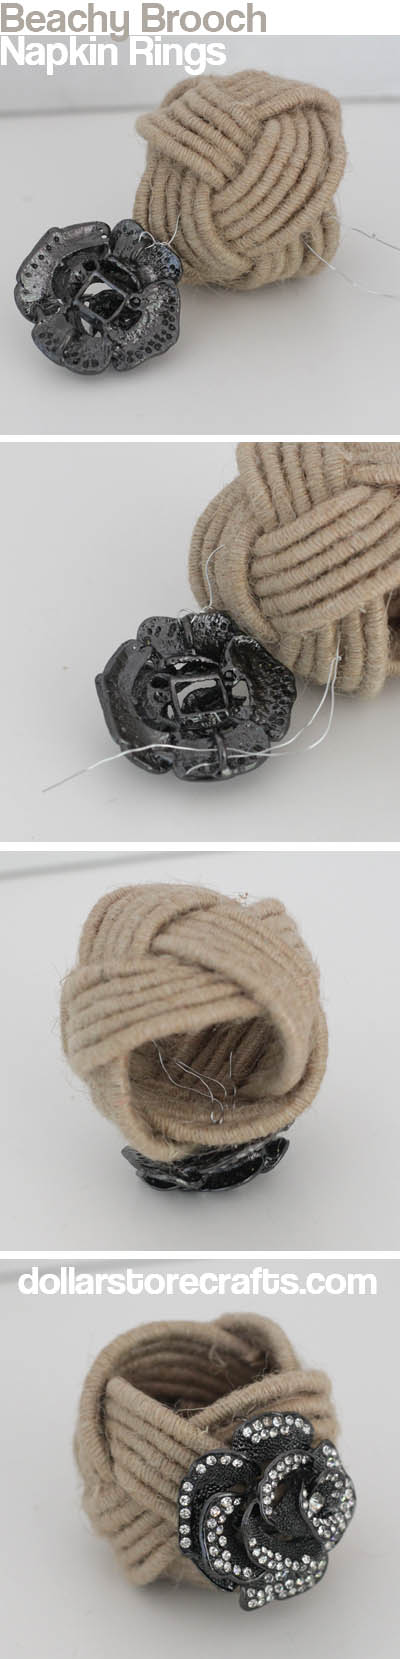 beachy brooch napkin rings